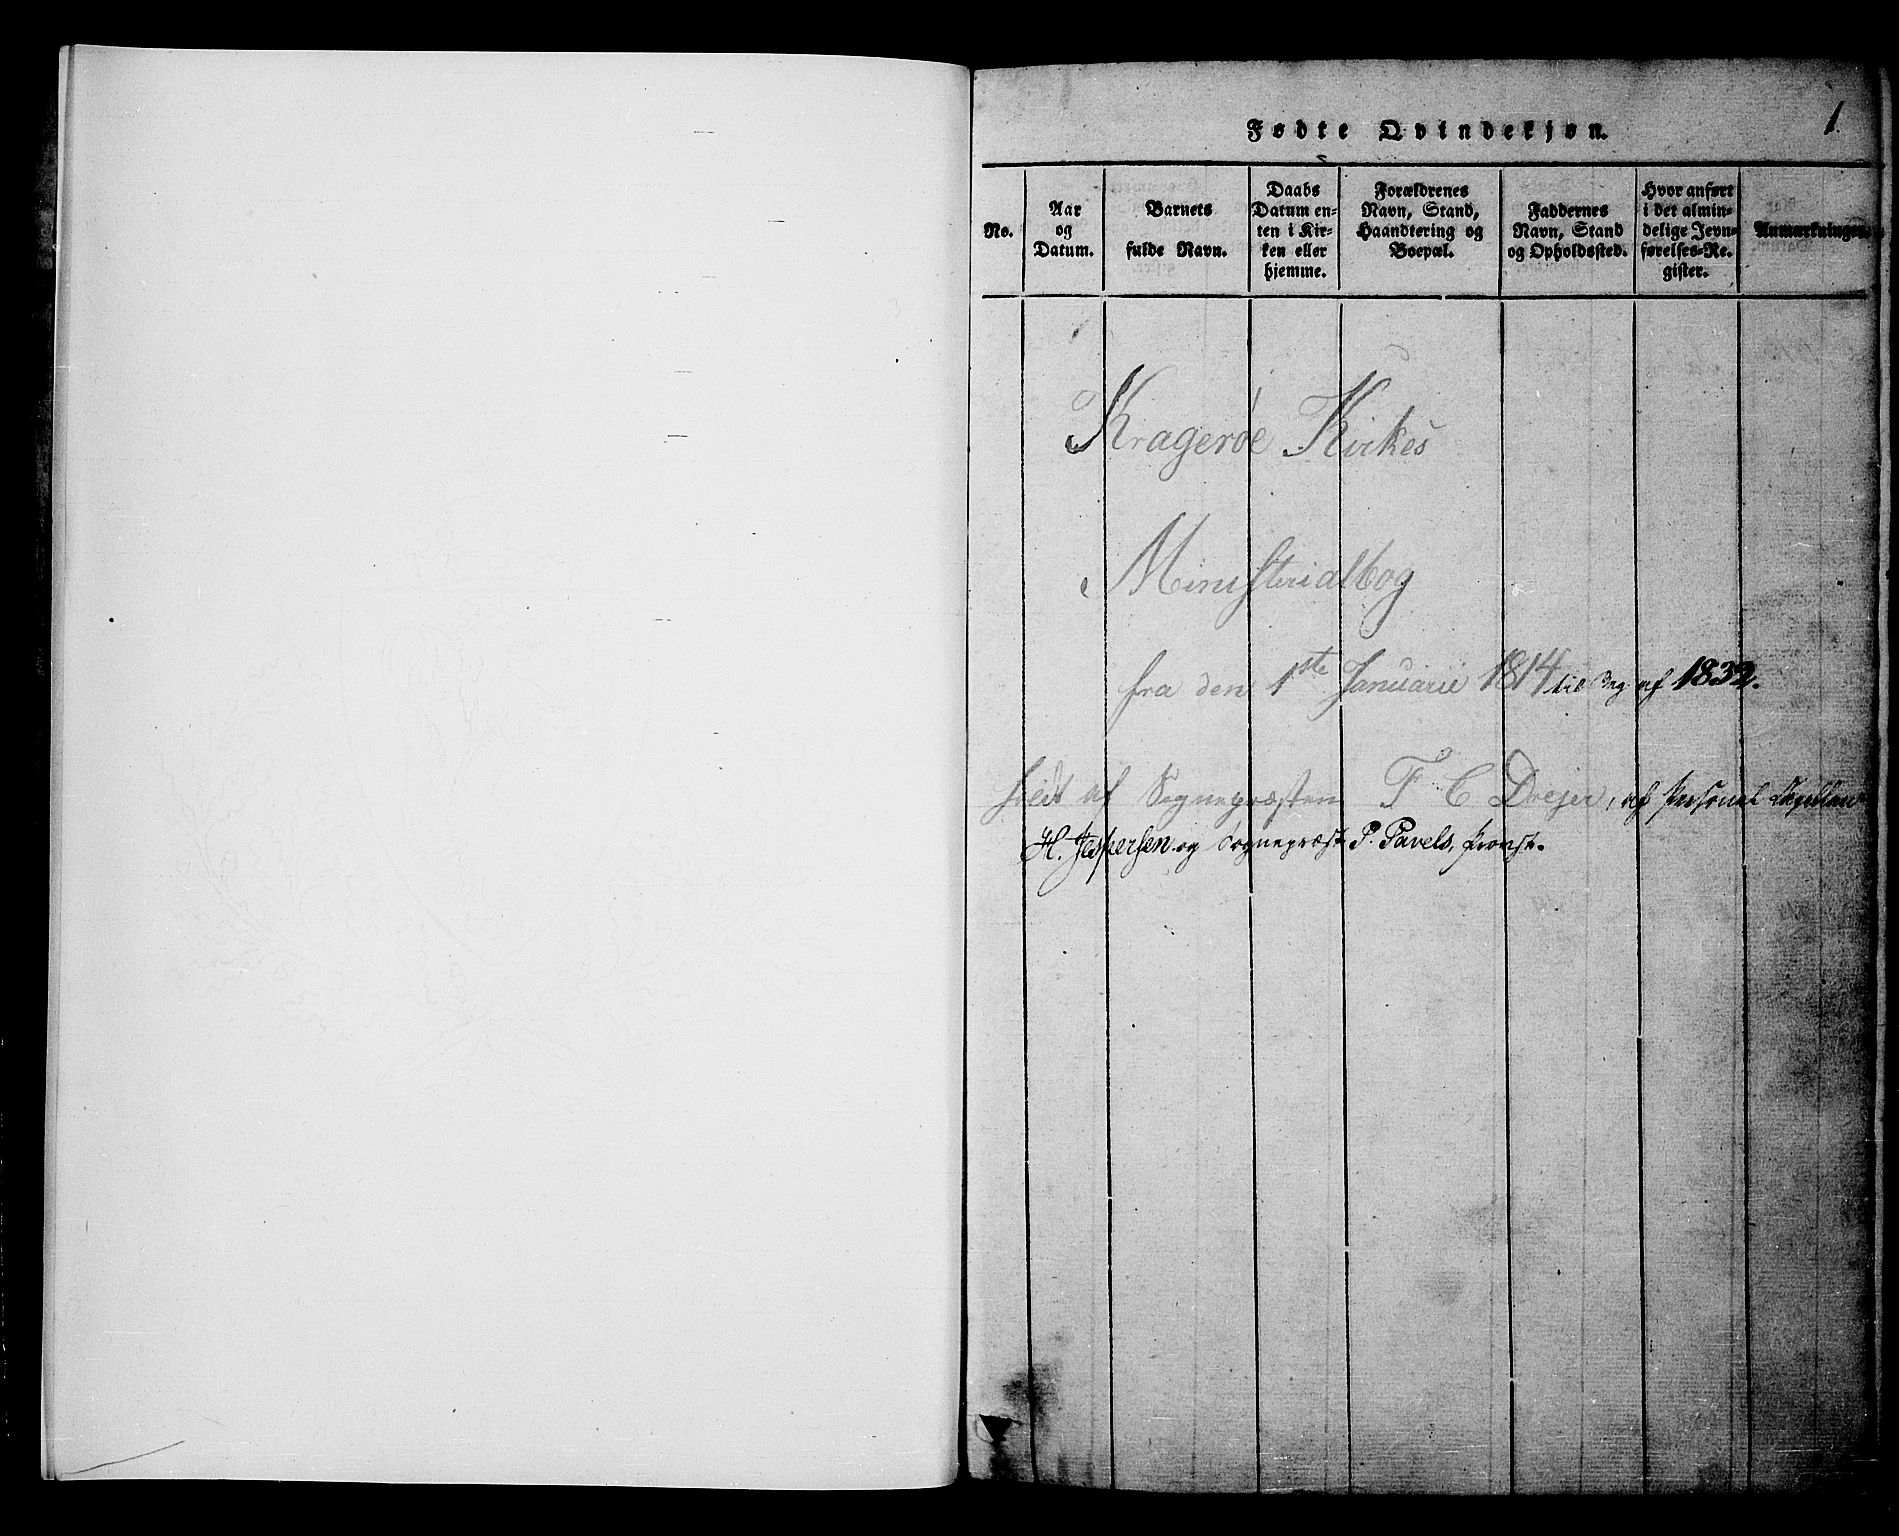 SAKO, Kragerø kirkebøker, F/Fa/L0004: Ministerialbok nr. 4, 1814-1831, s. 1